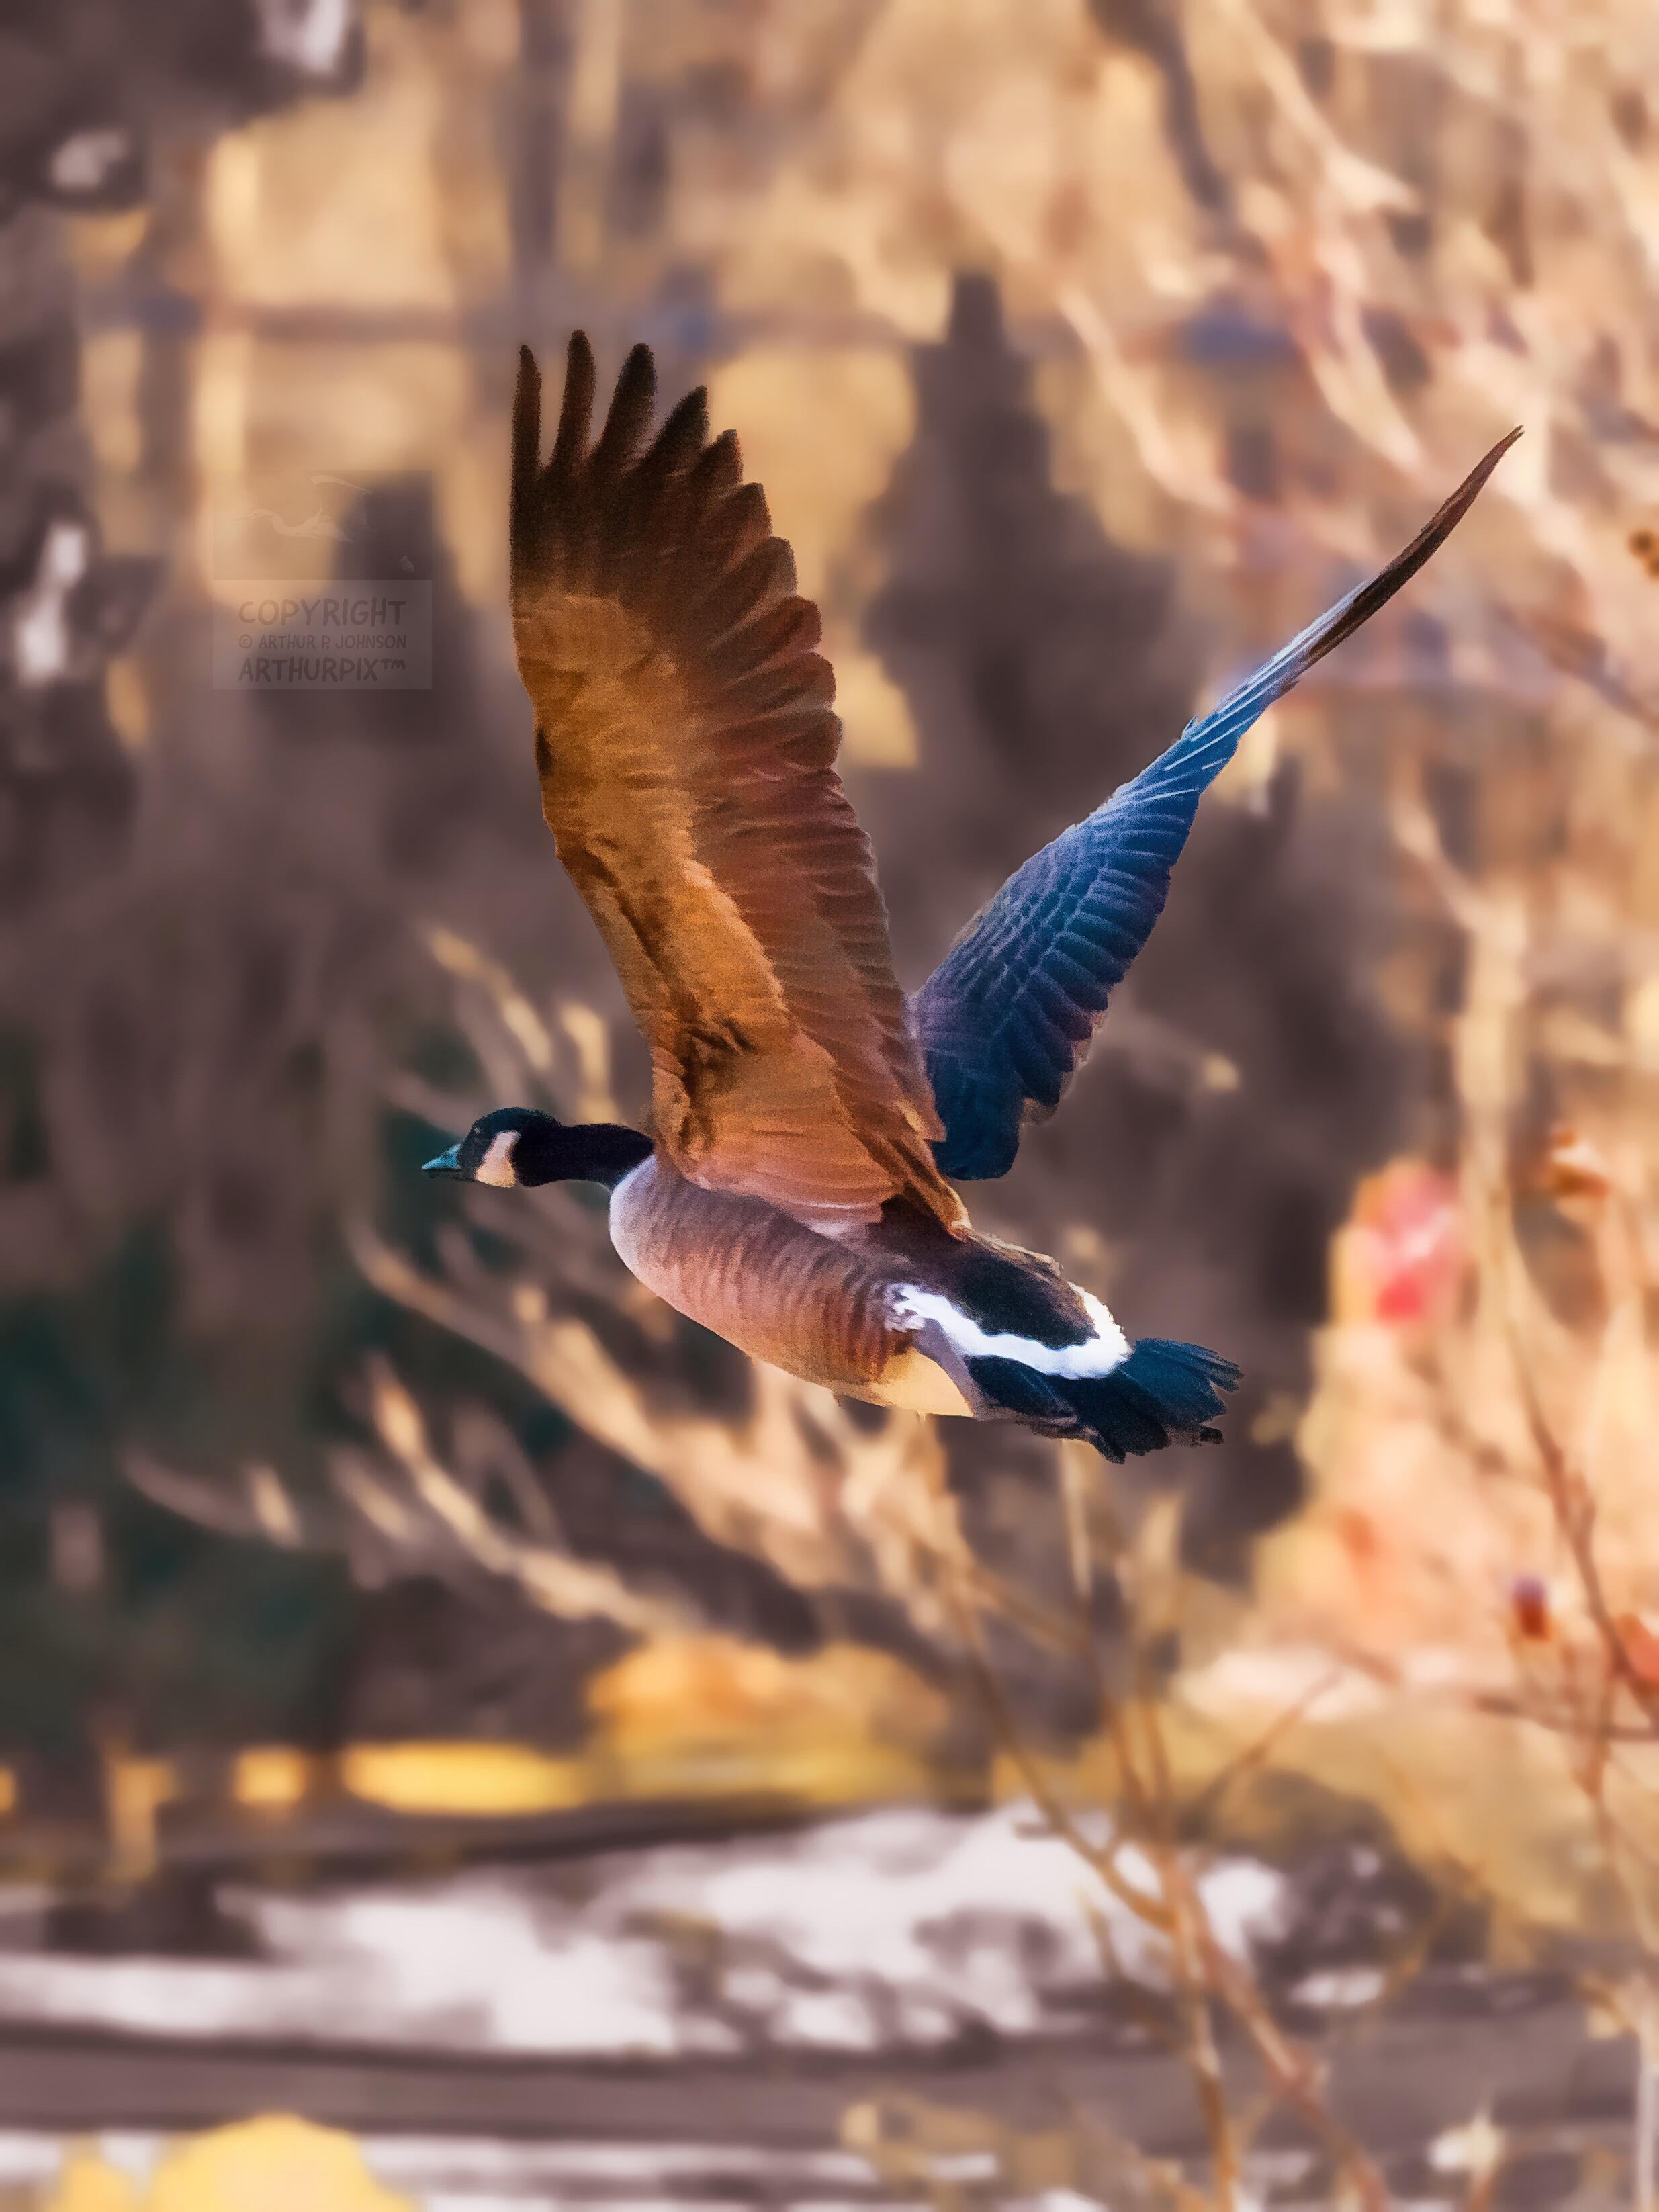 Canada Goose taking flight, winter 2017